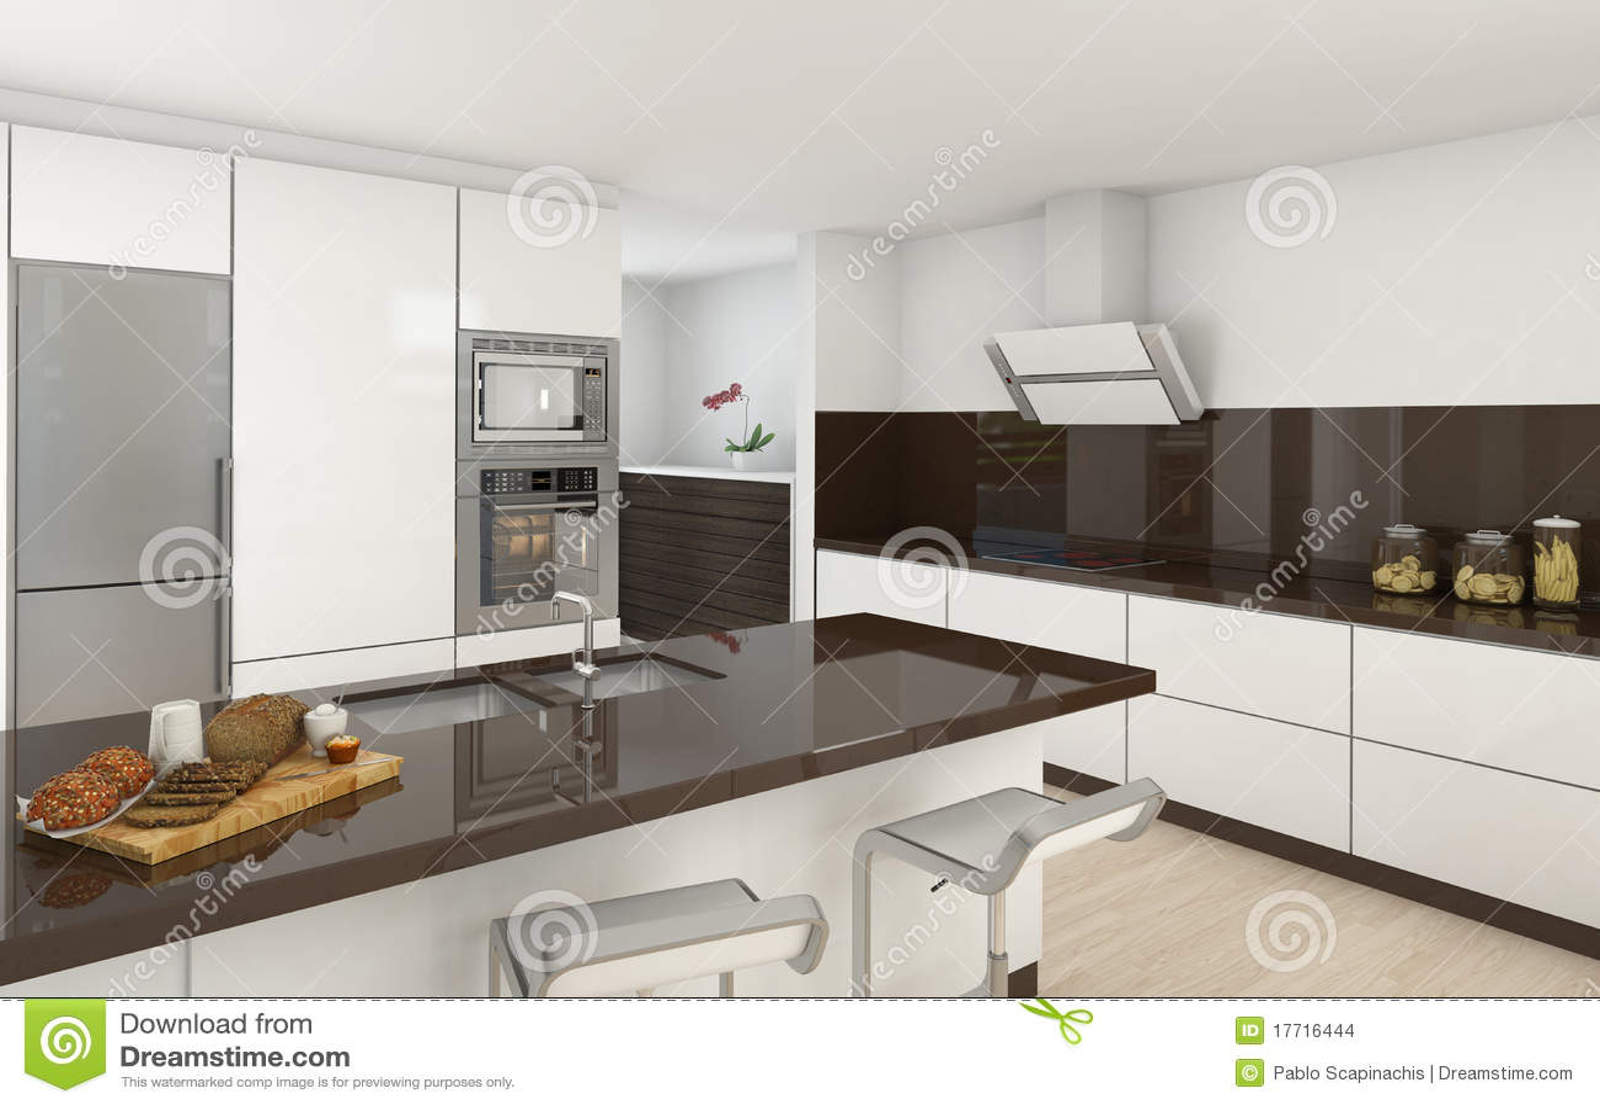 Moderne Keuken Kleuren : Brown and White Modern Kitchen